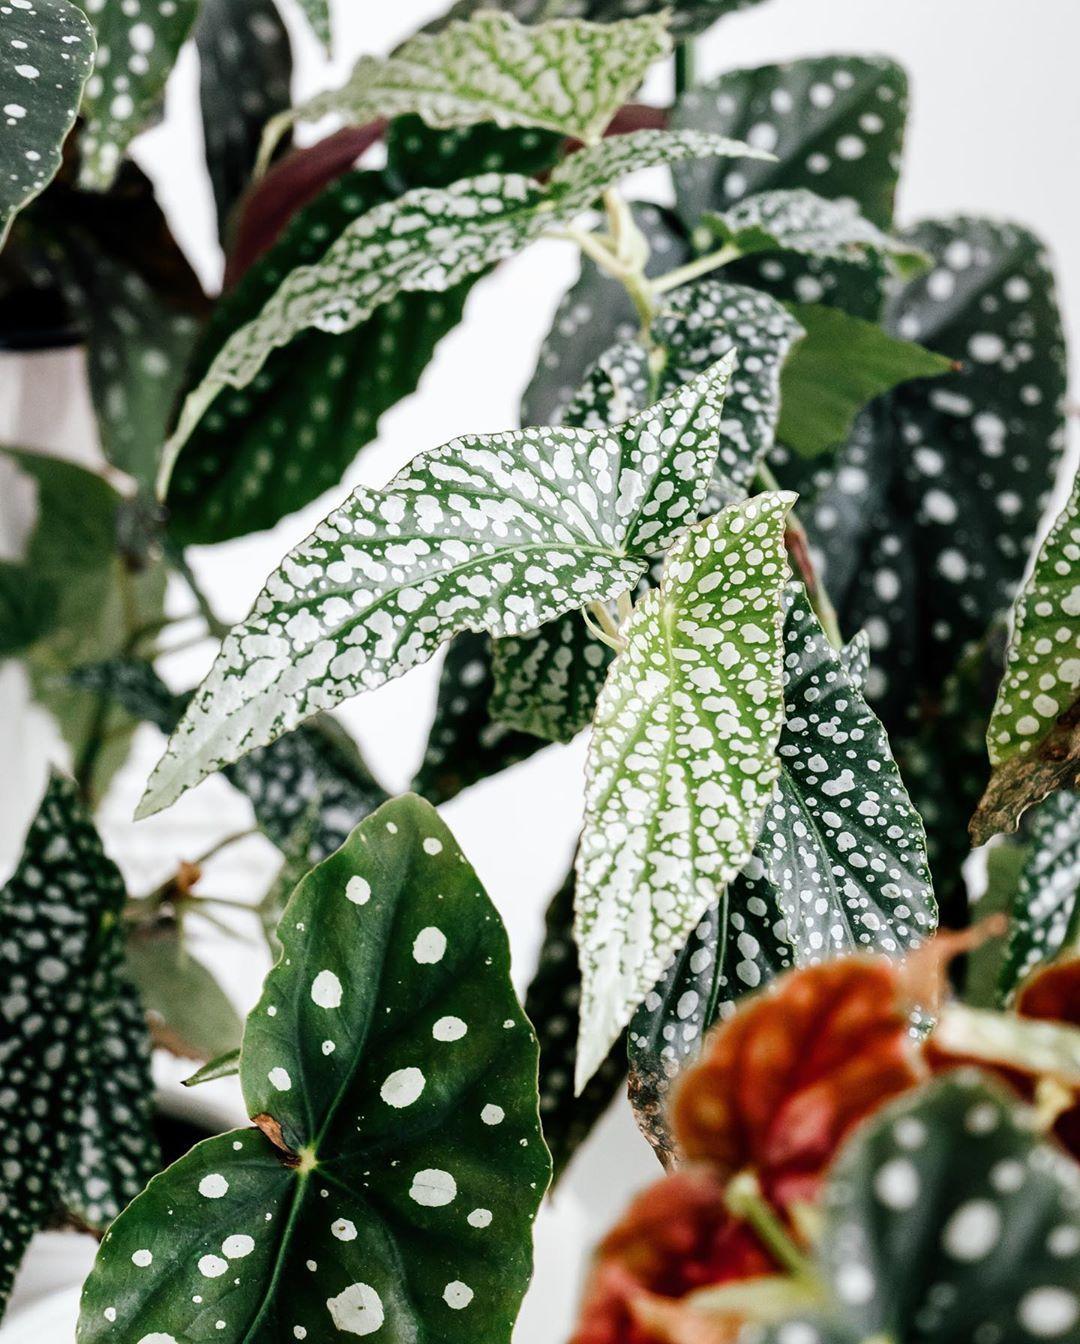 Begonia White Ice Begonia Maculata Wightii Begonia Maculata